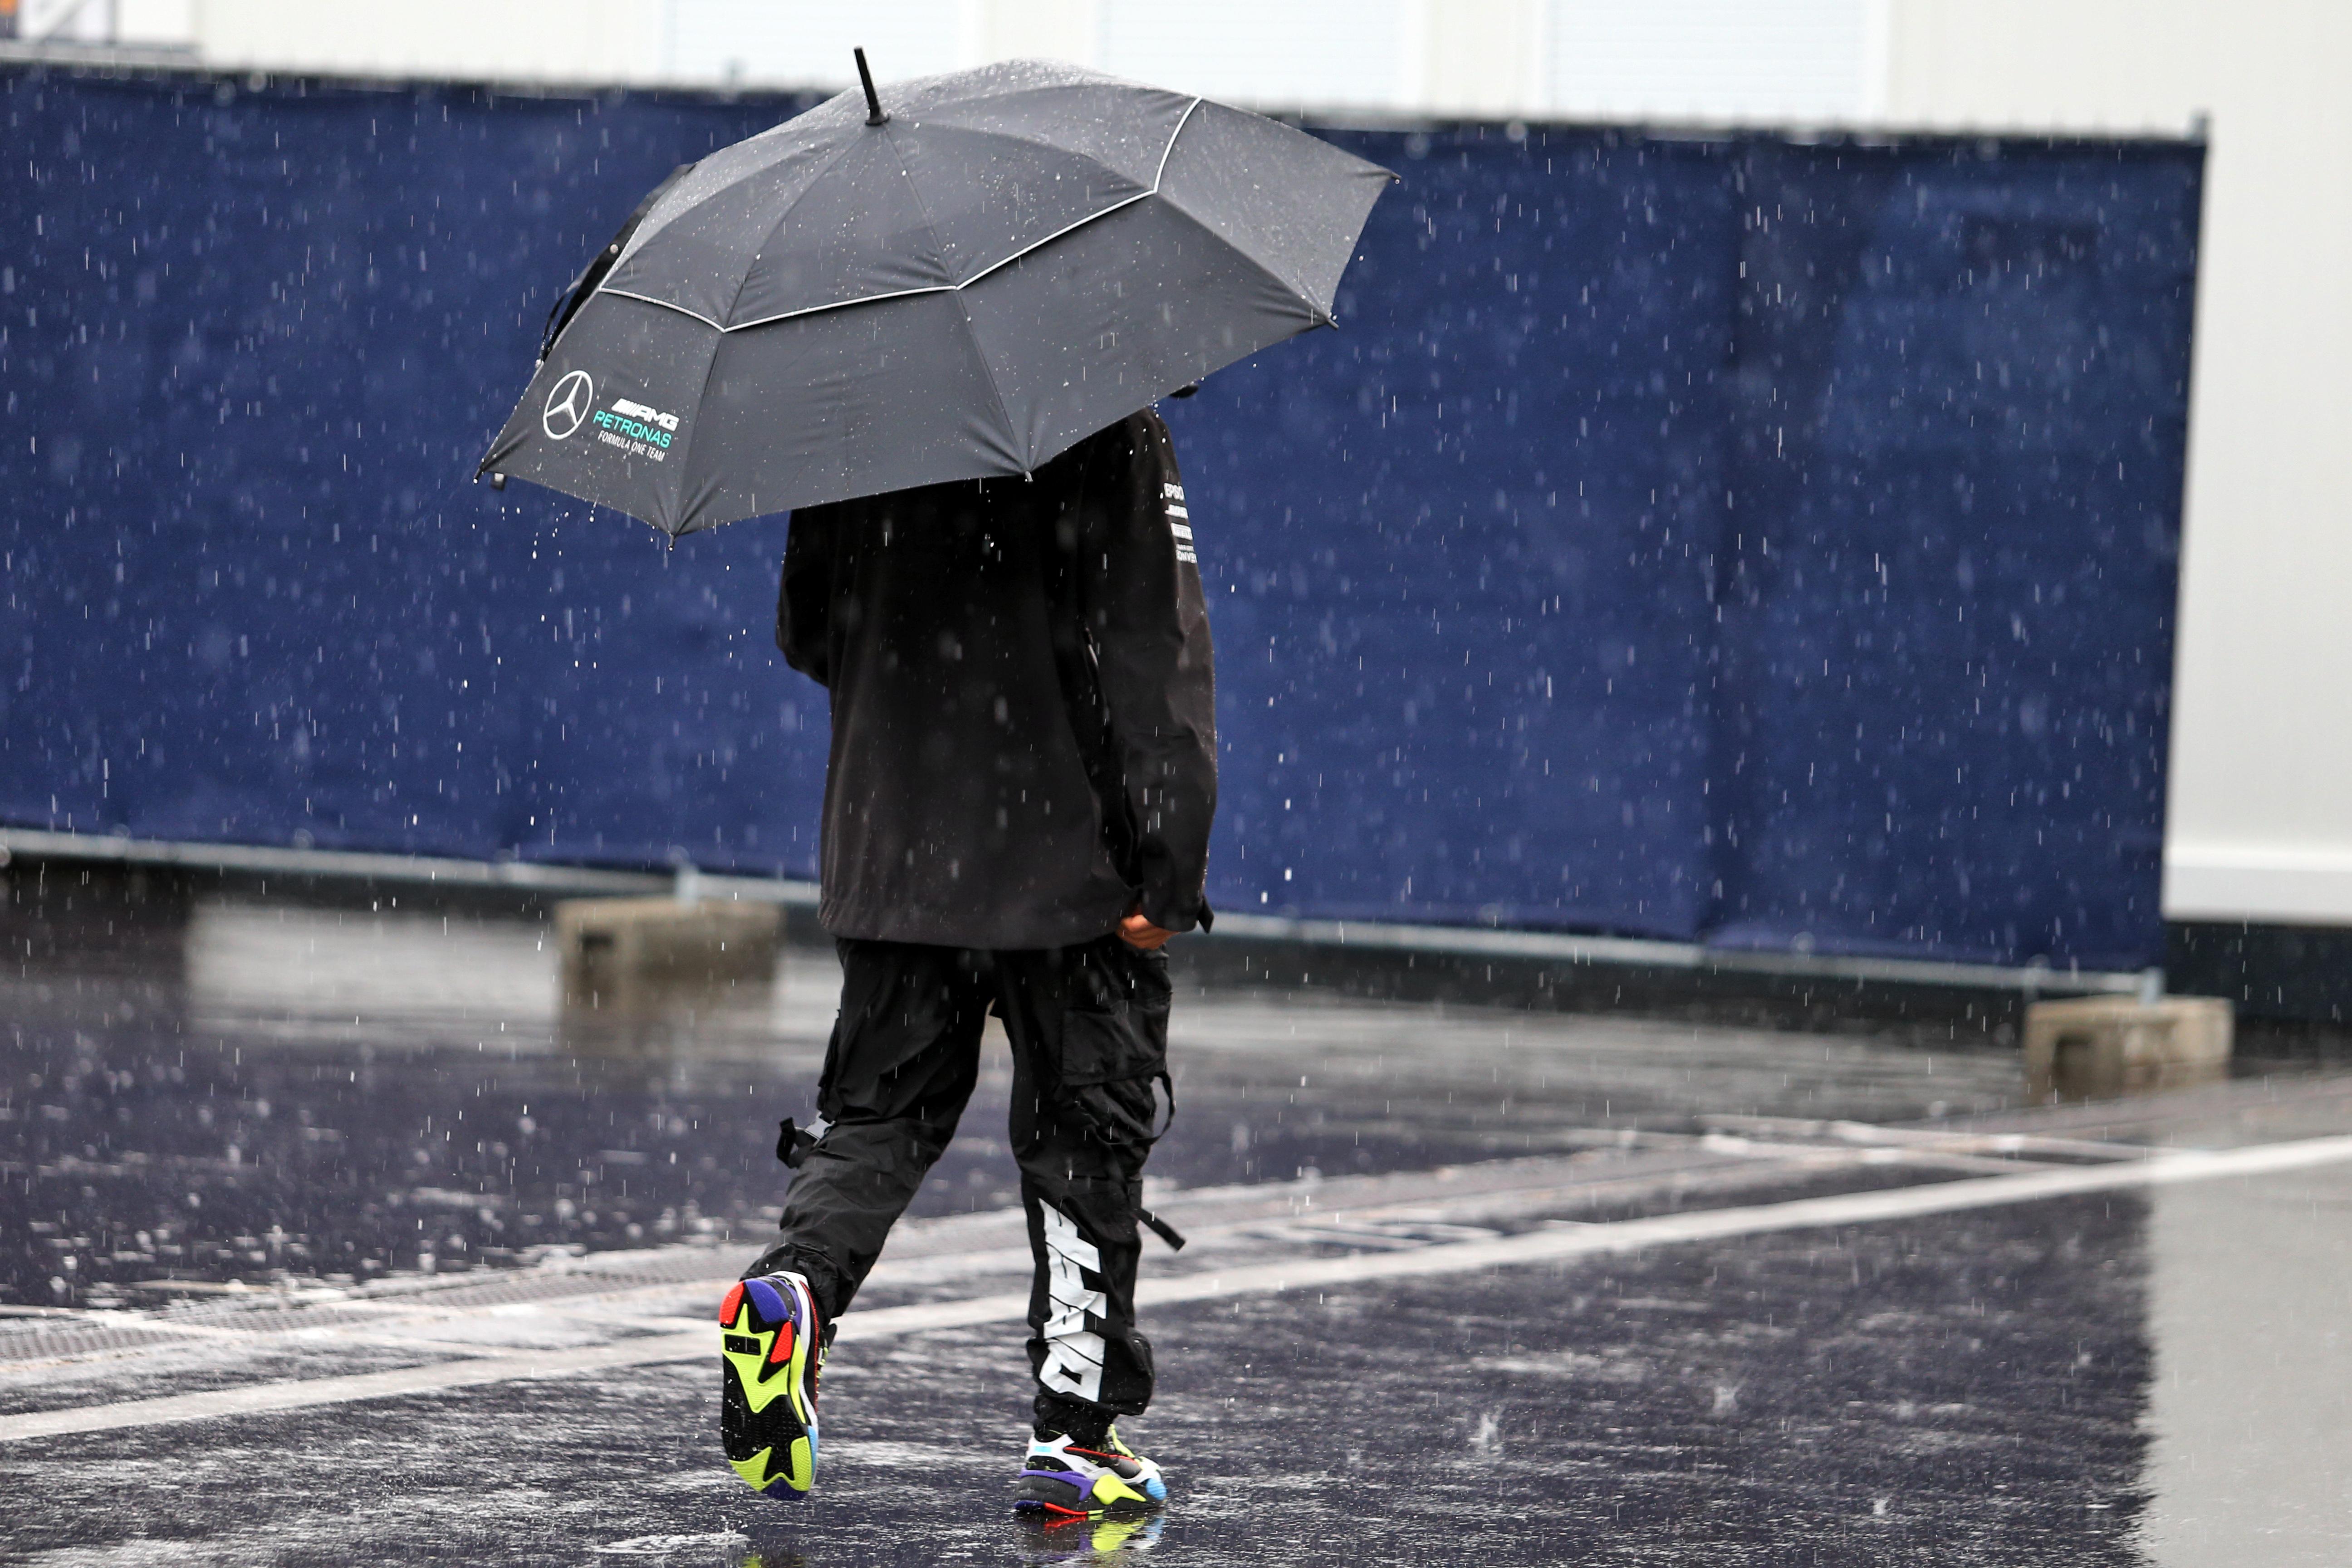 Lewis Hamilton Styrian GP paddock rain 2020